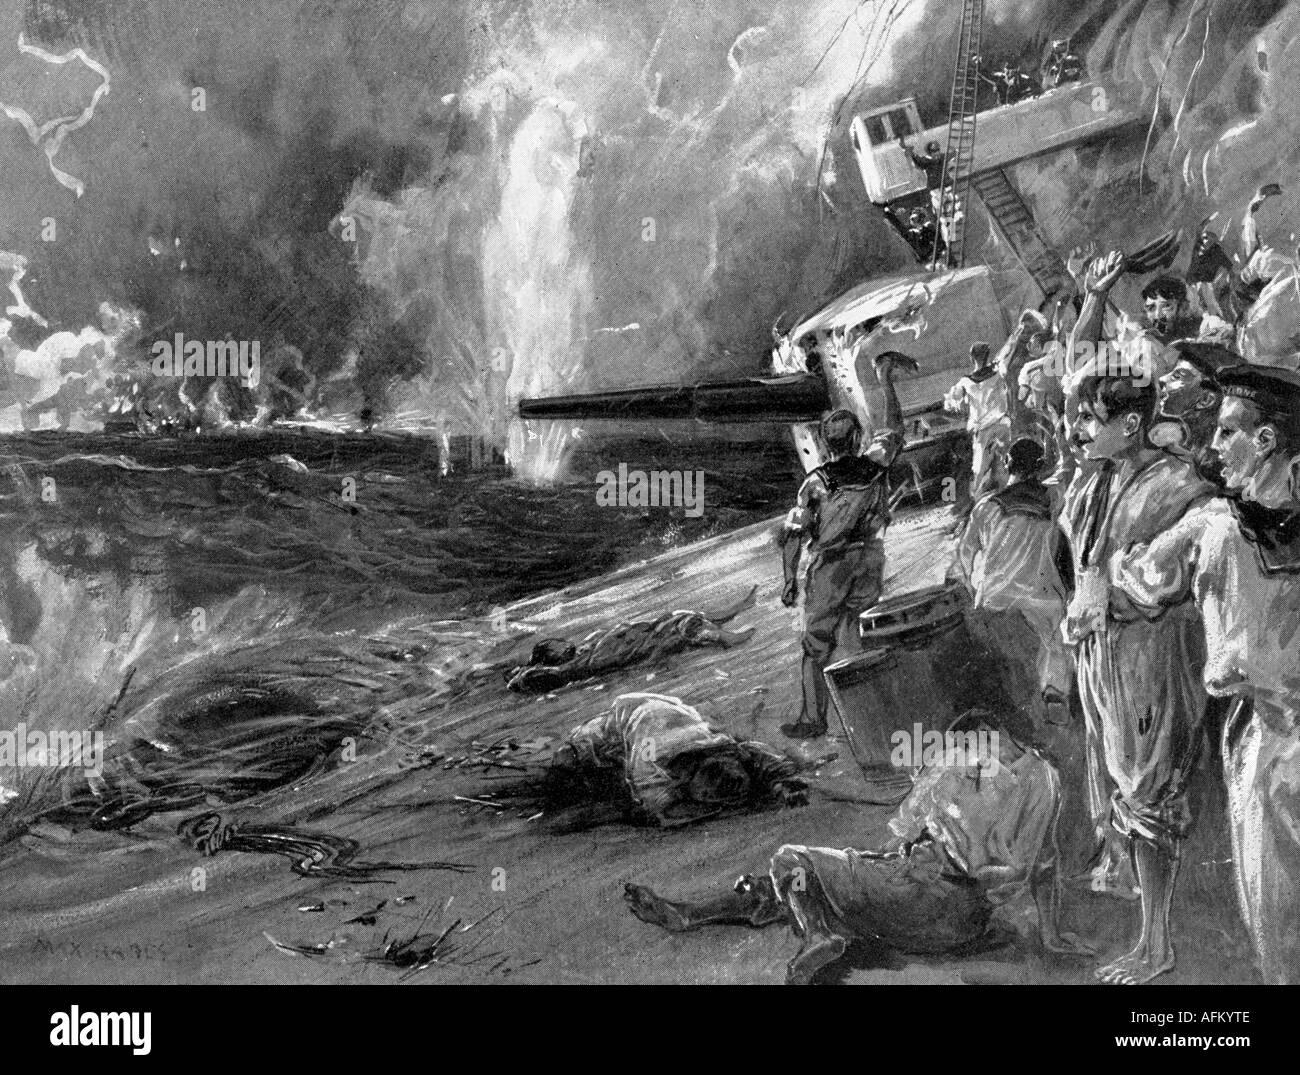 Events First World War Wwi Naval Warfare Battle Of Jutland Stock Photo Royalty Free Image